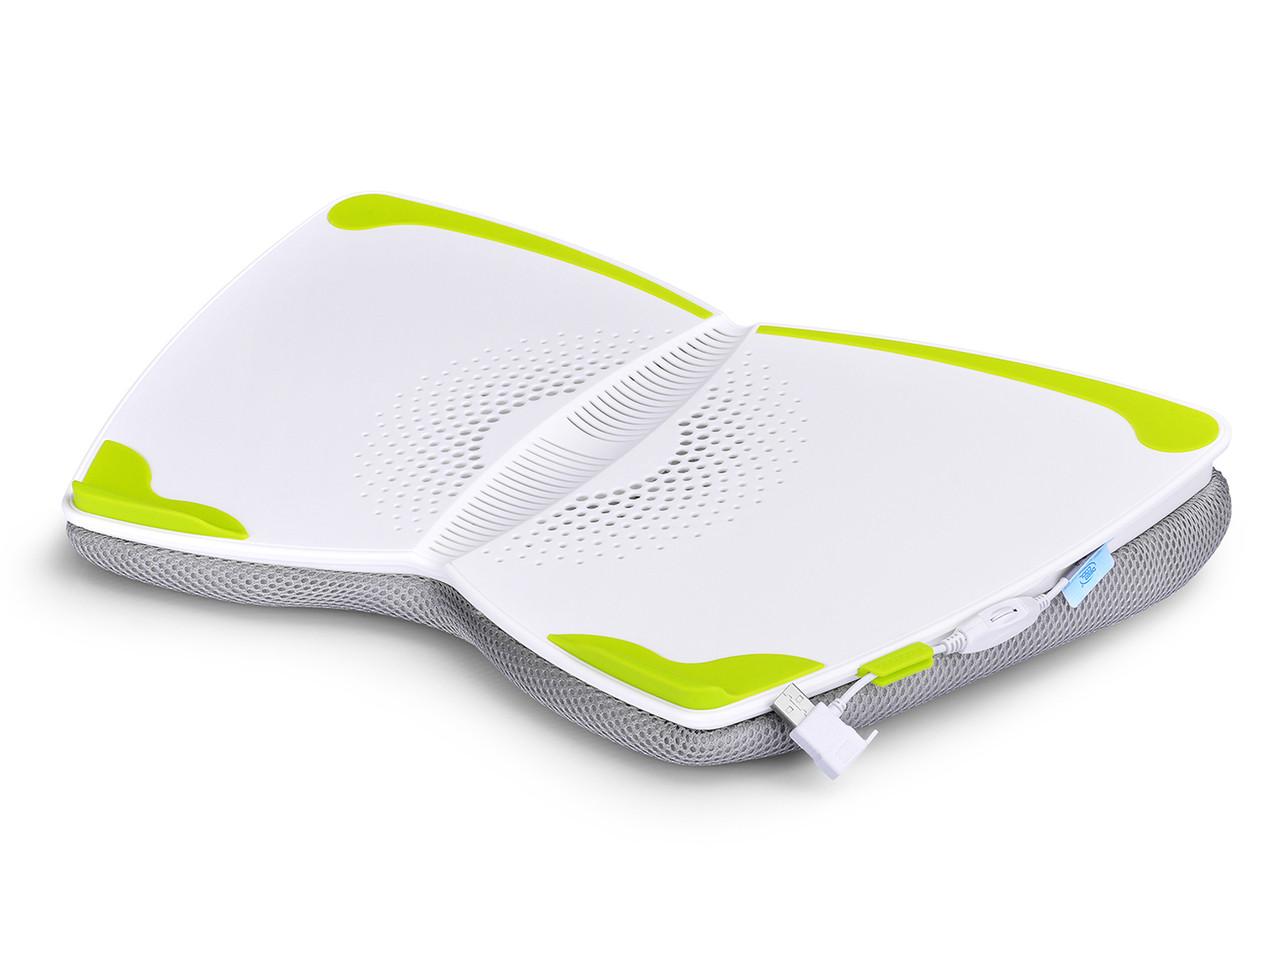 Deepcool E Lap Ergonomic Cooling Pad For Use On U Pal Usb 30 Notebook Cooler Black Image 1